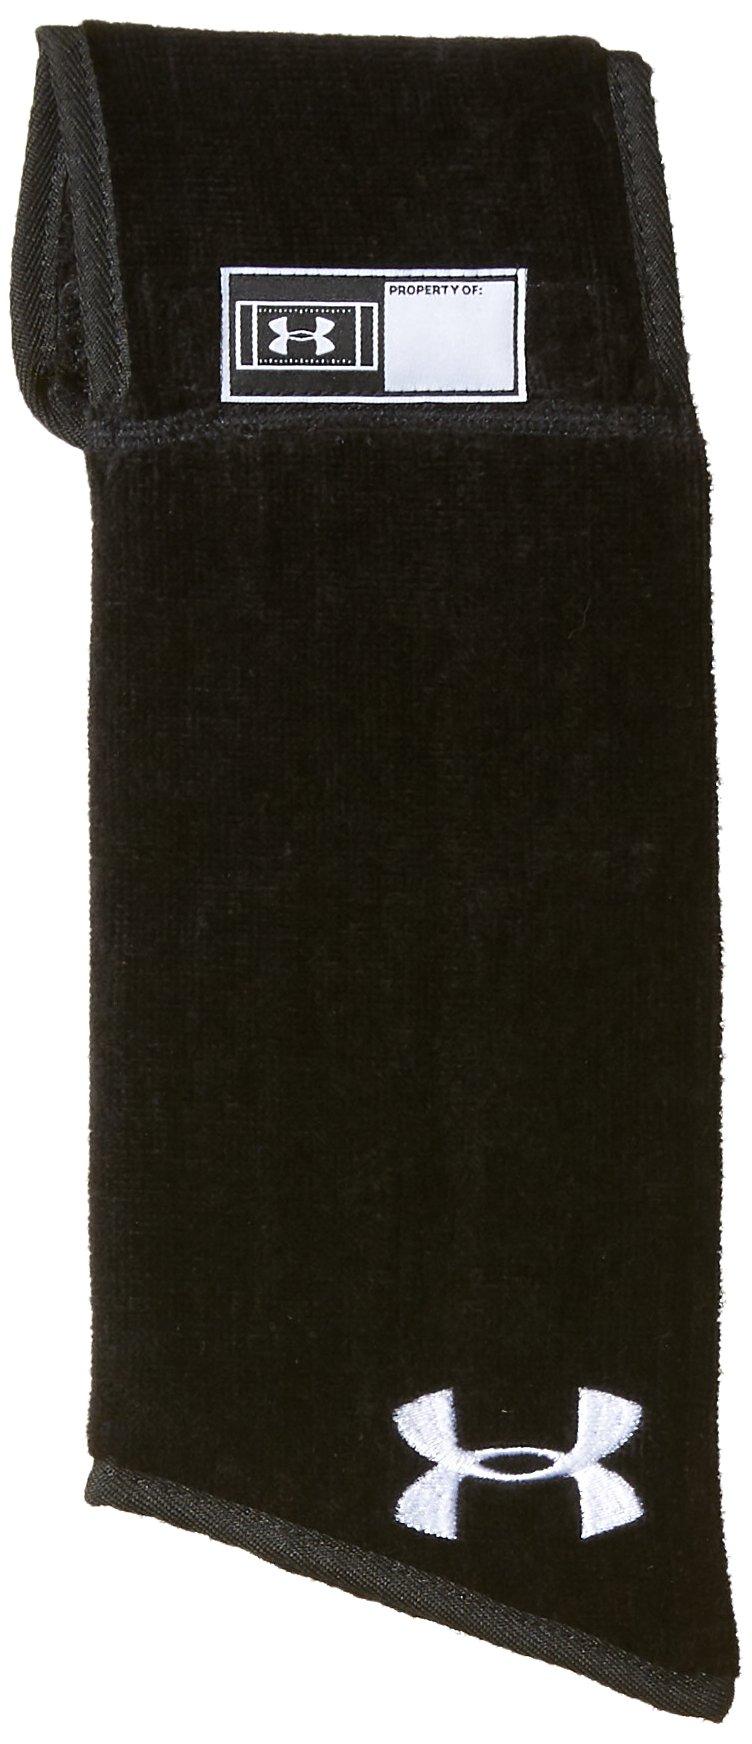 Under Armour SkiILL Towel Black